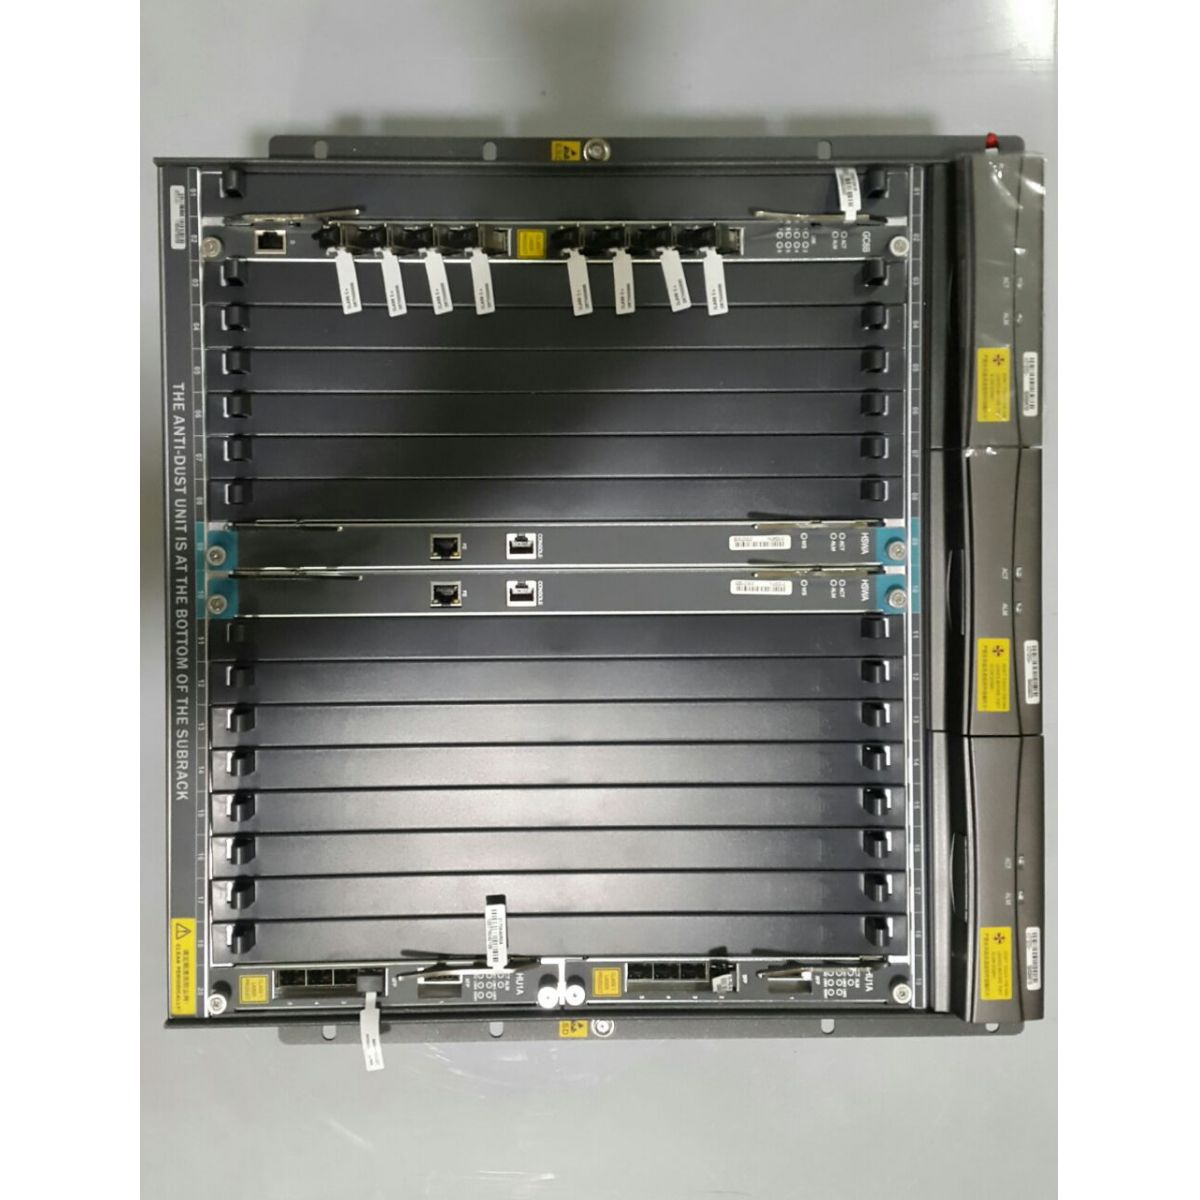 OLT AN5116-06B FBH 11U 2X HU1A+2X HSWA+GC8B  - TECTECH BRASIL COMPUTERS